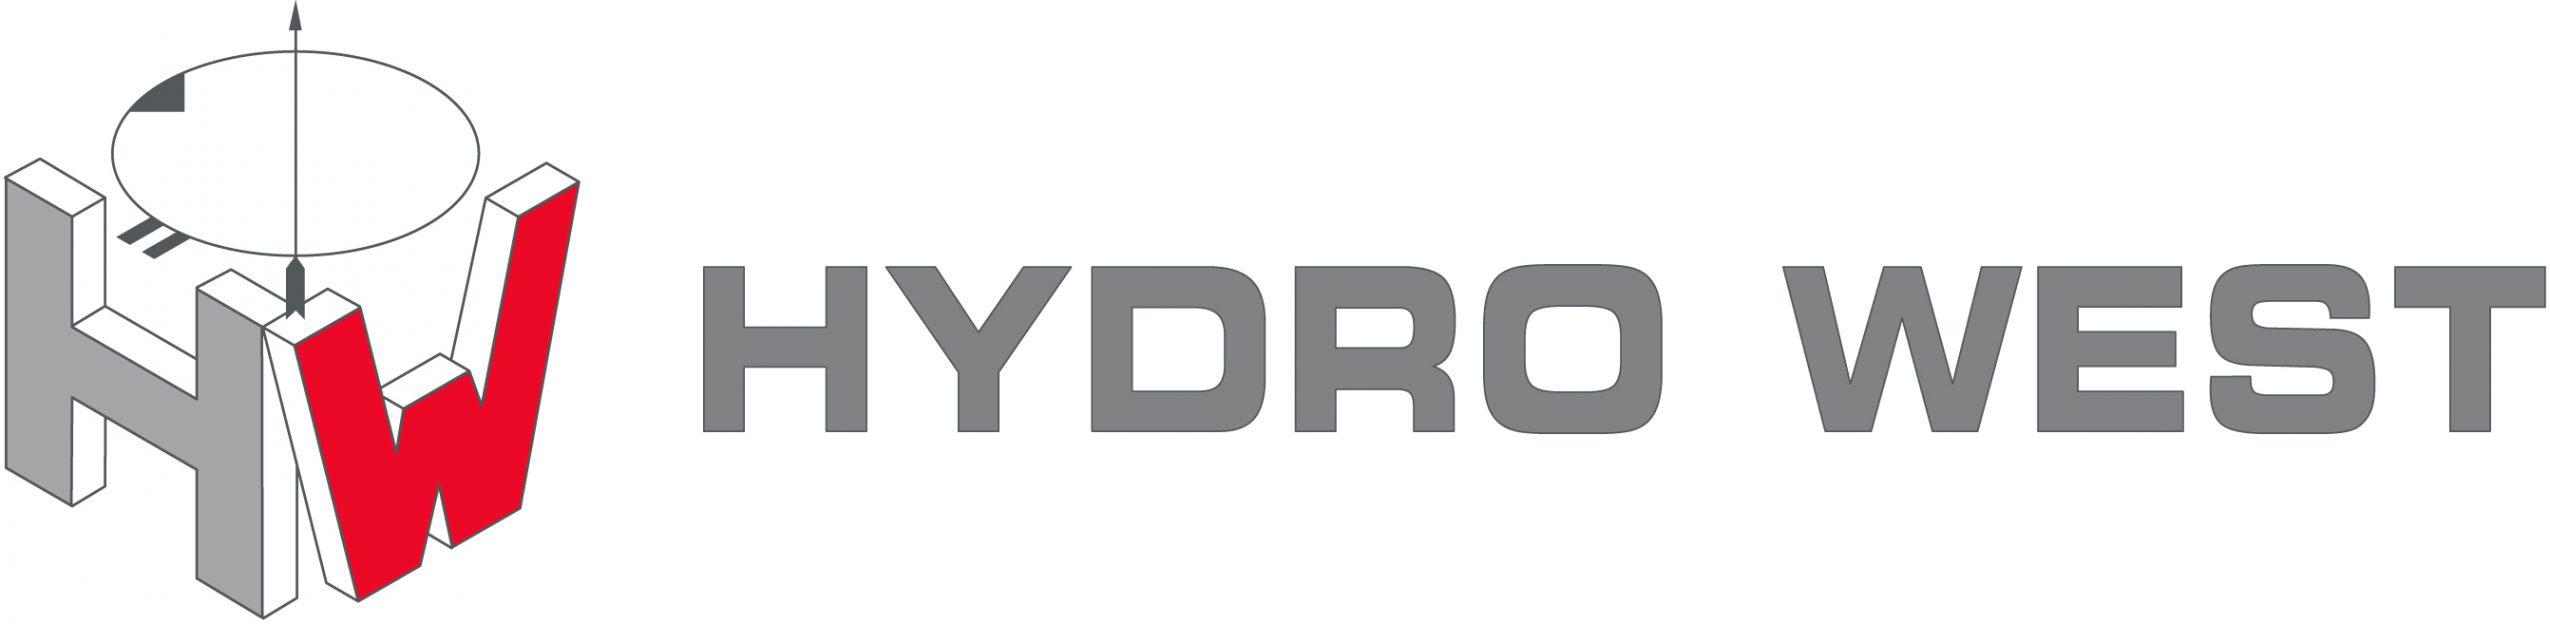 Hydro West